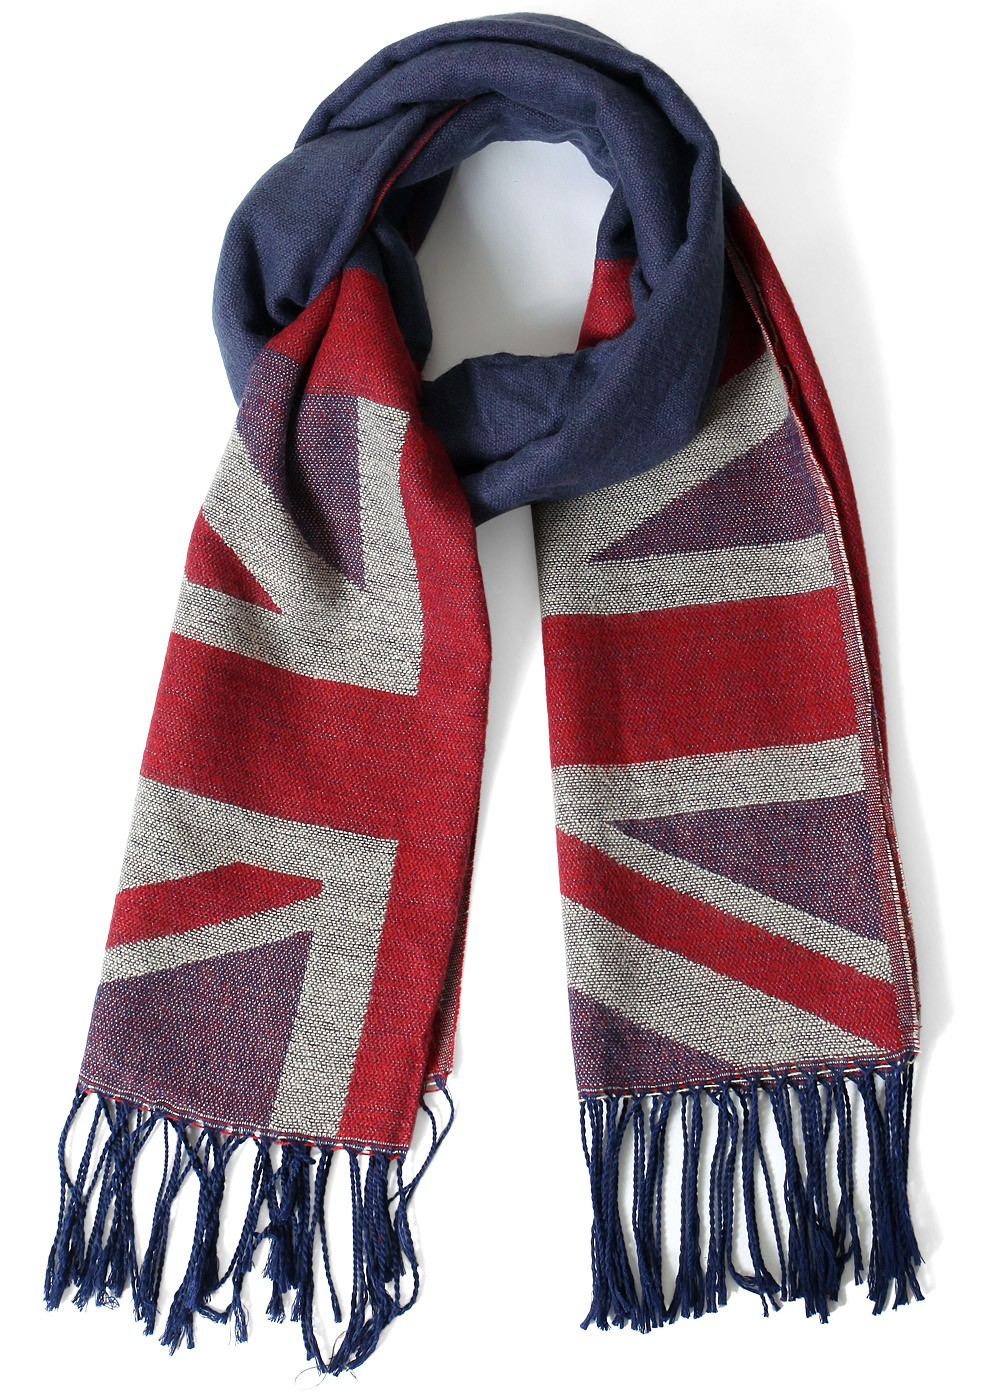 Flag print fringe scarf